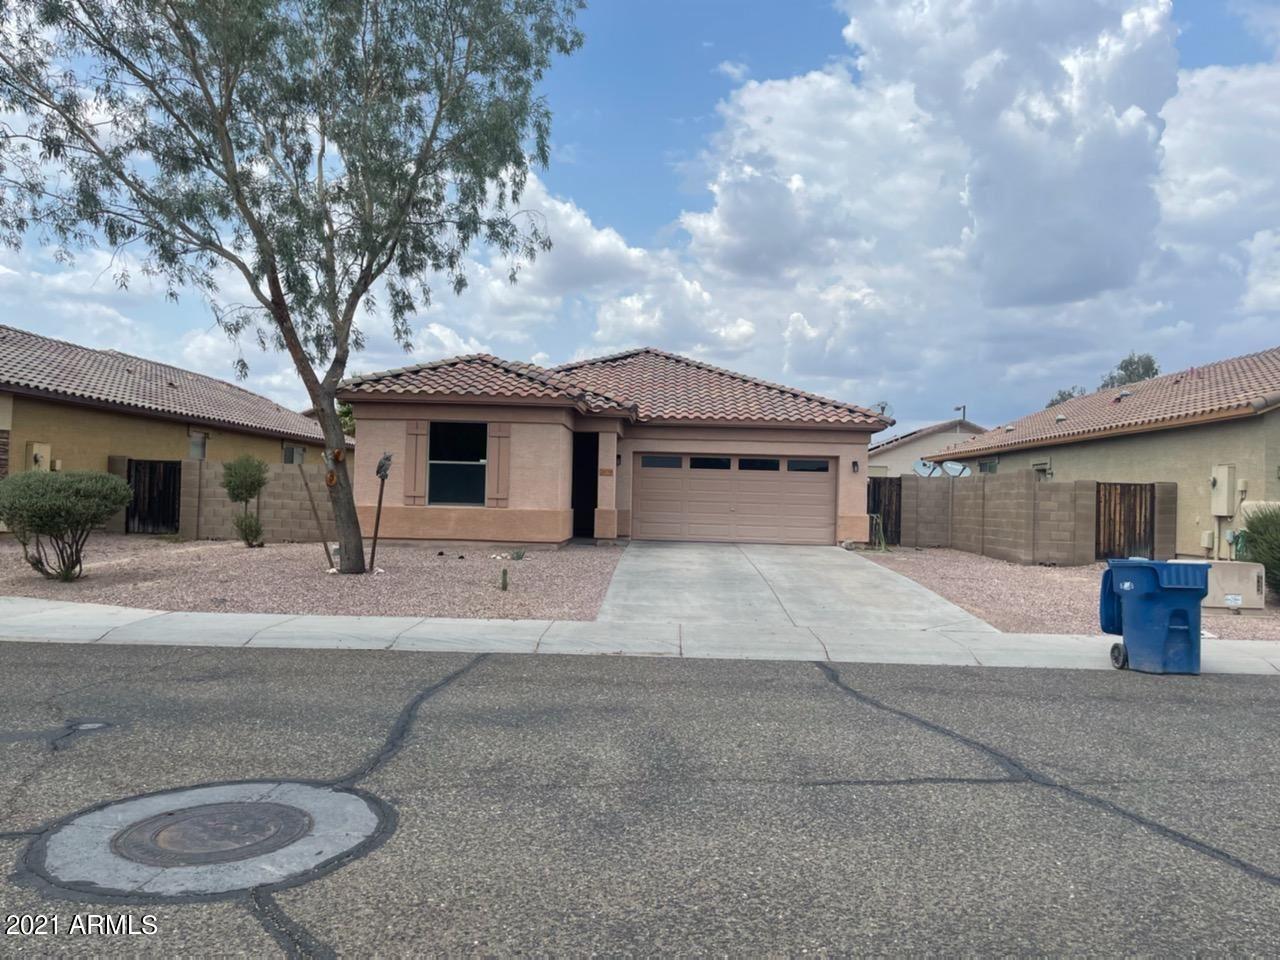 24758 W Dove Peak --, Buckeye, AZ 85326 - MLS#: 6267402